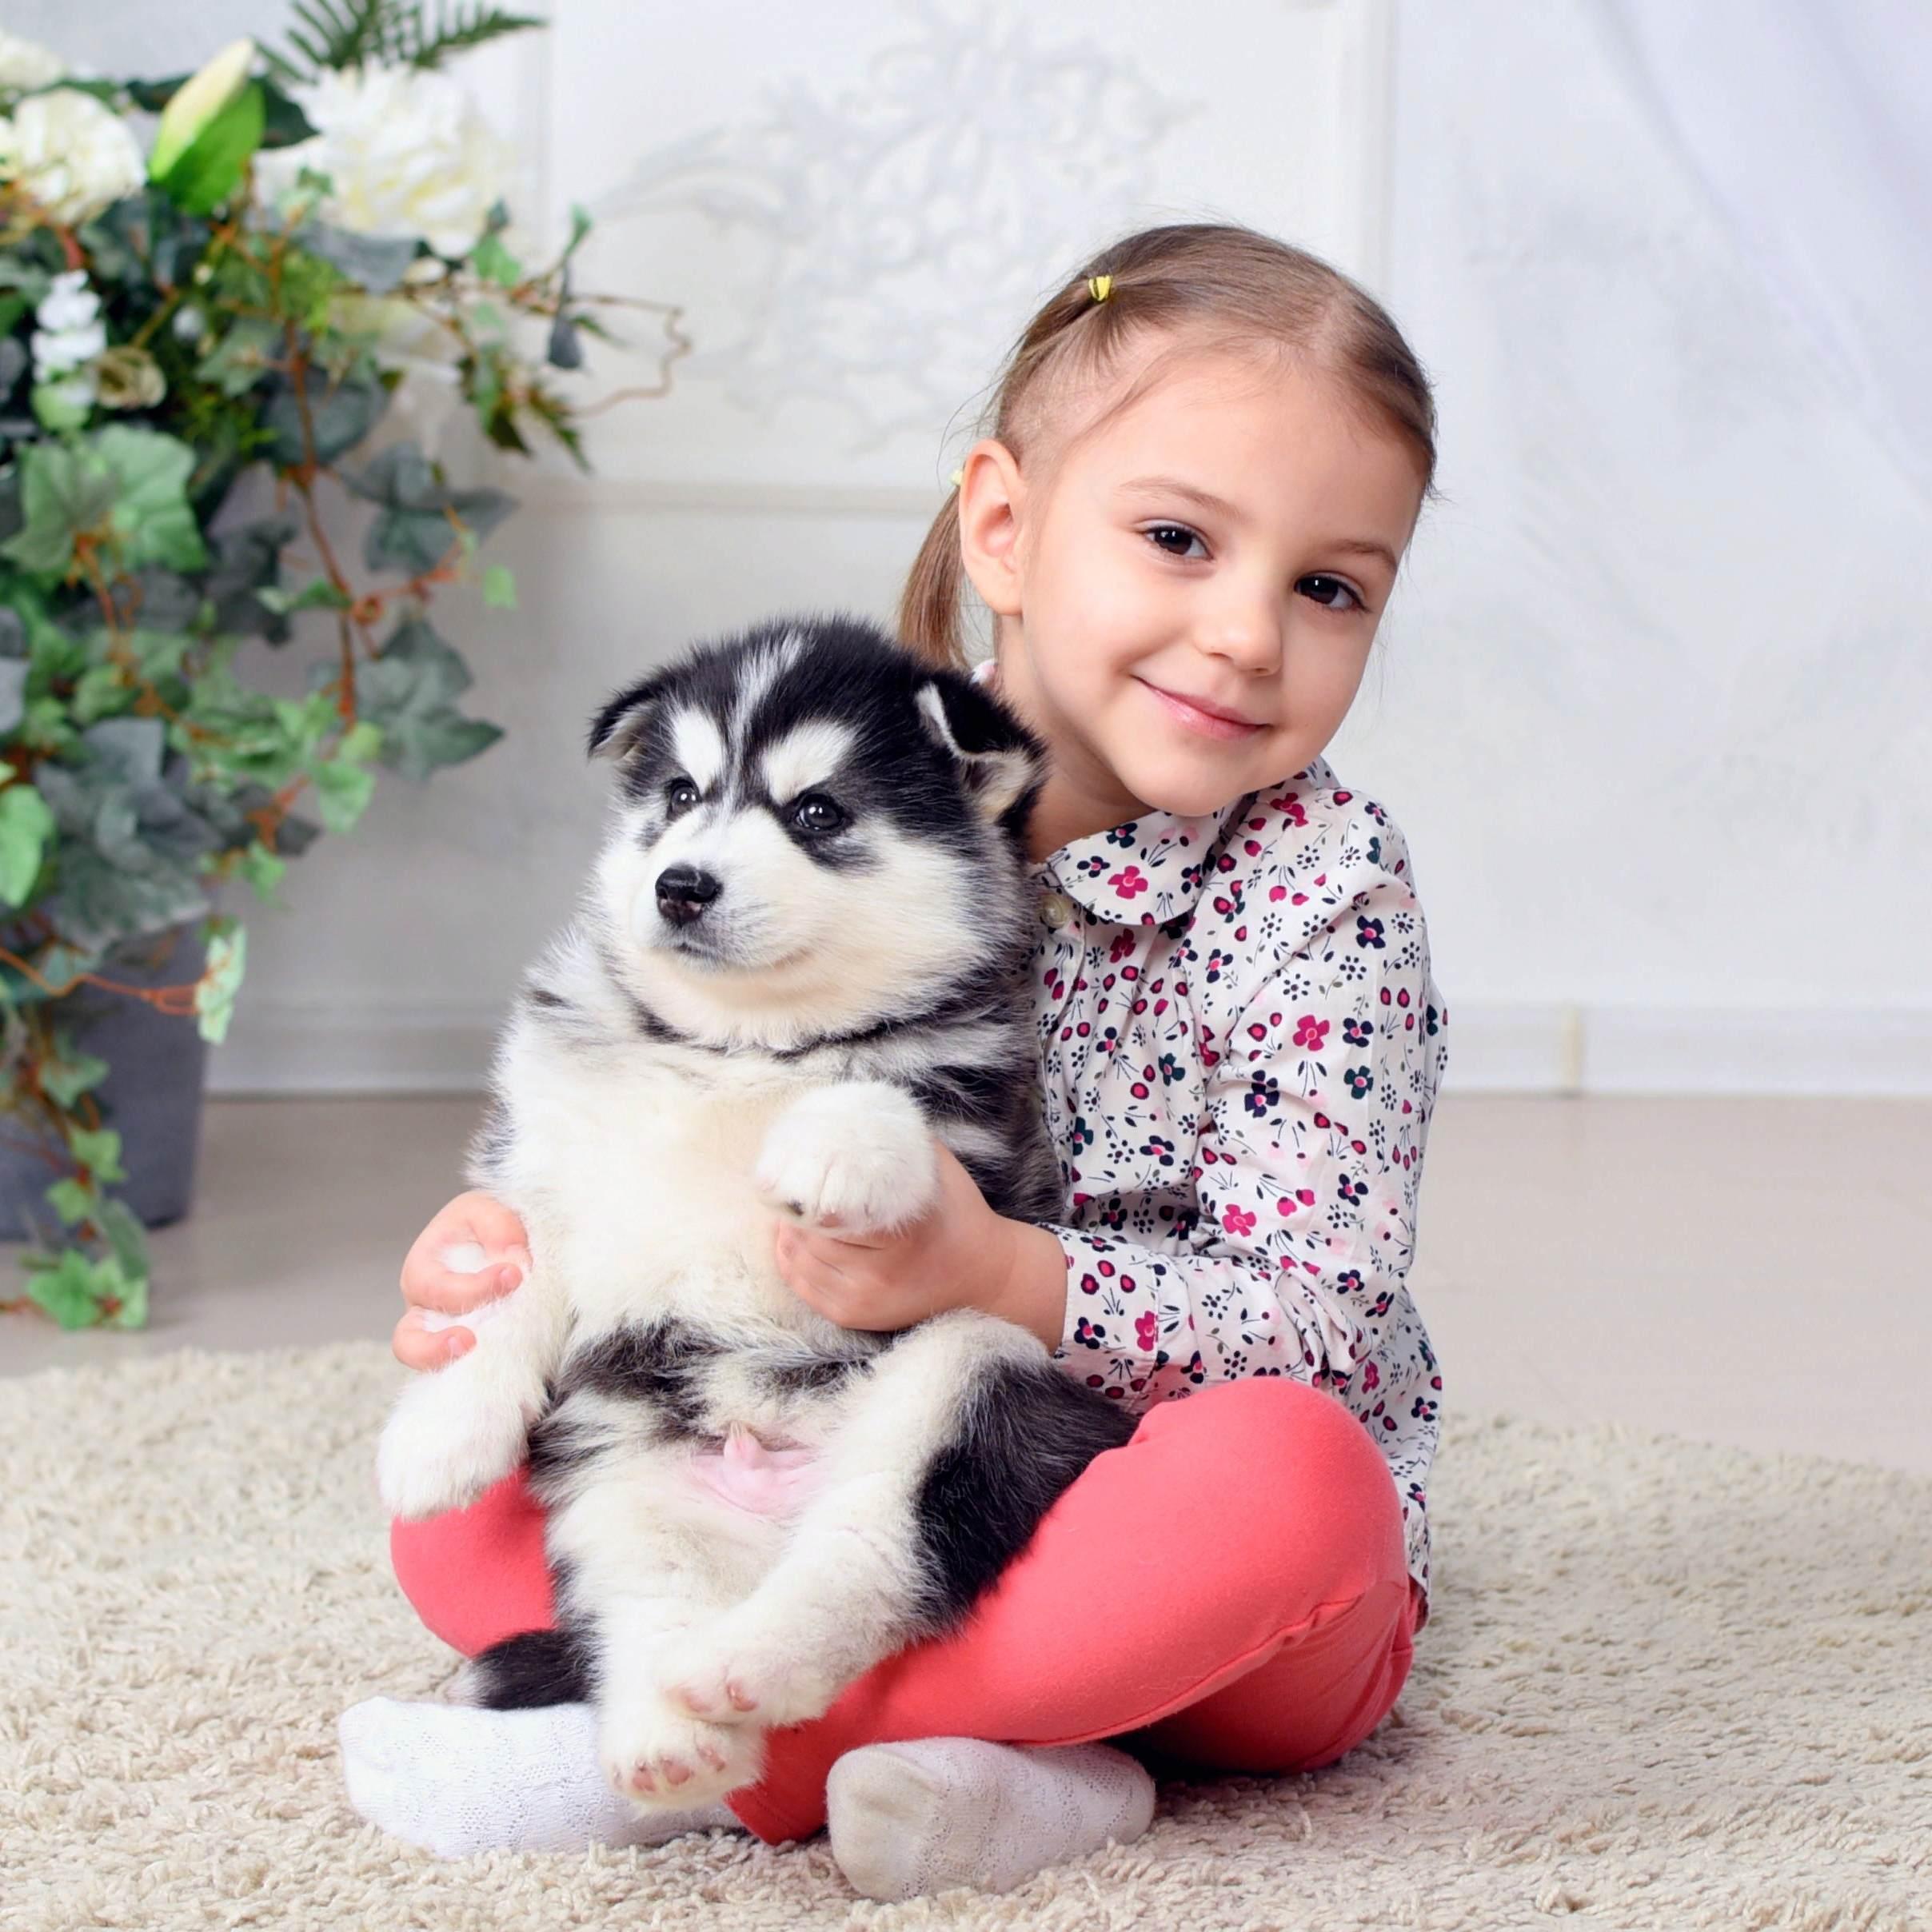 Фотопроект «Сказка со щенками хаски» со скидкой 65%